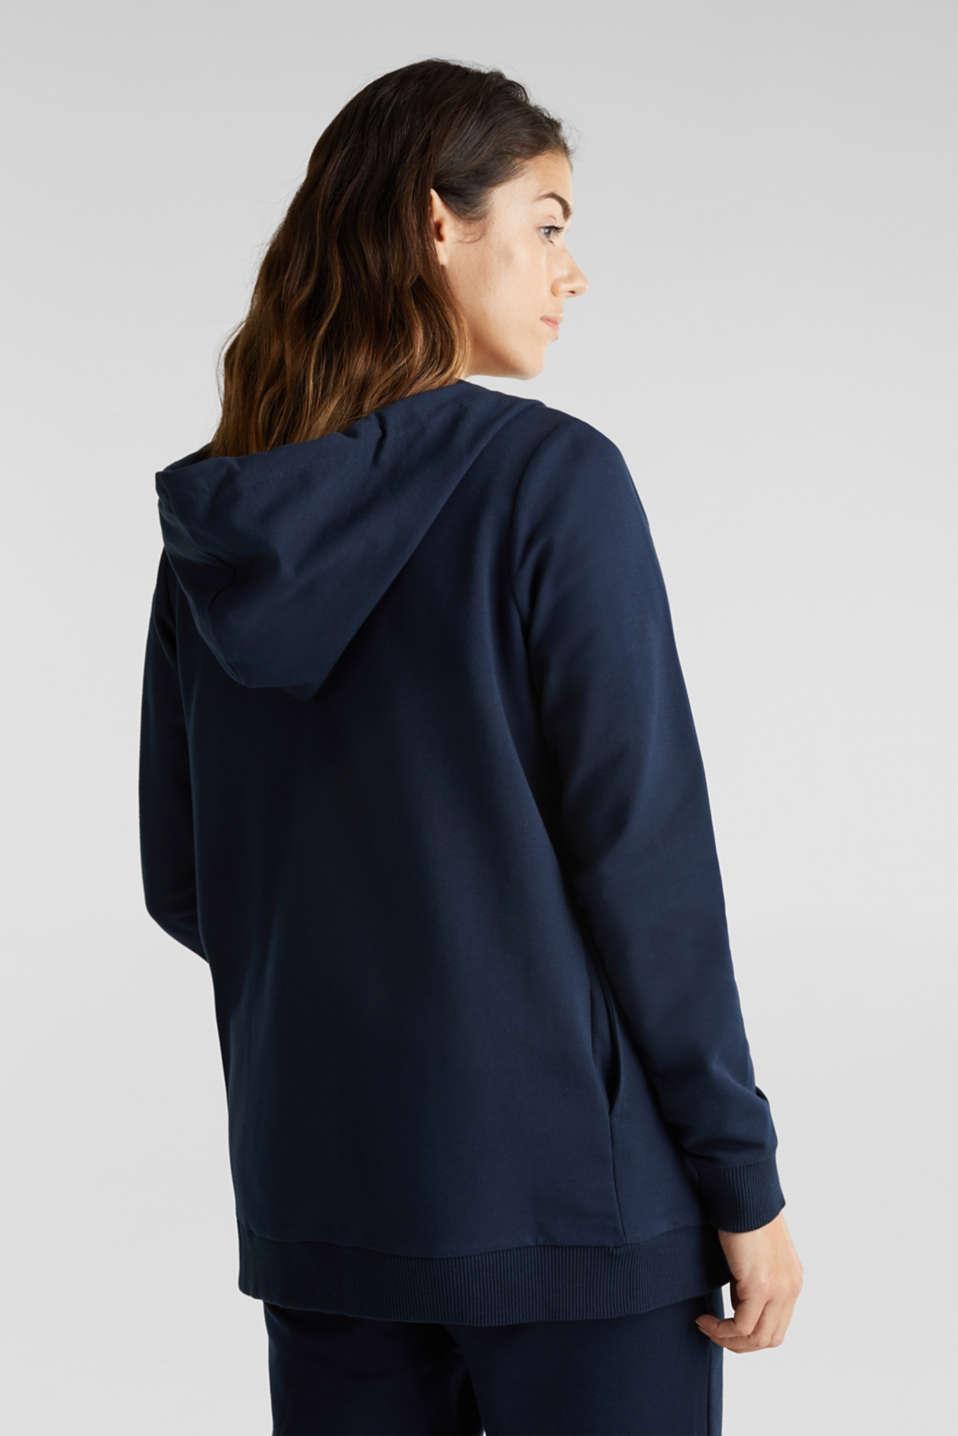 3-way, hooded sweatshirt jacket, LCNIGHT BLUE, detail image number 3